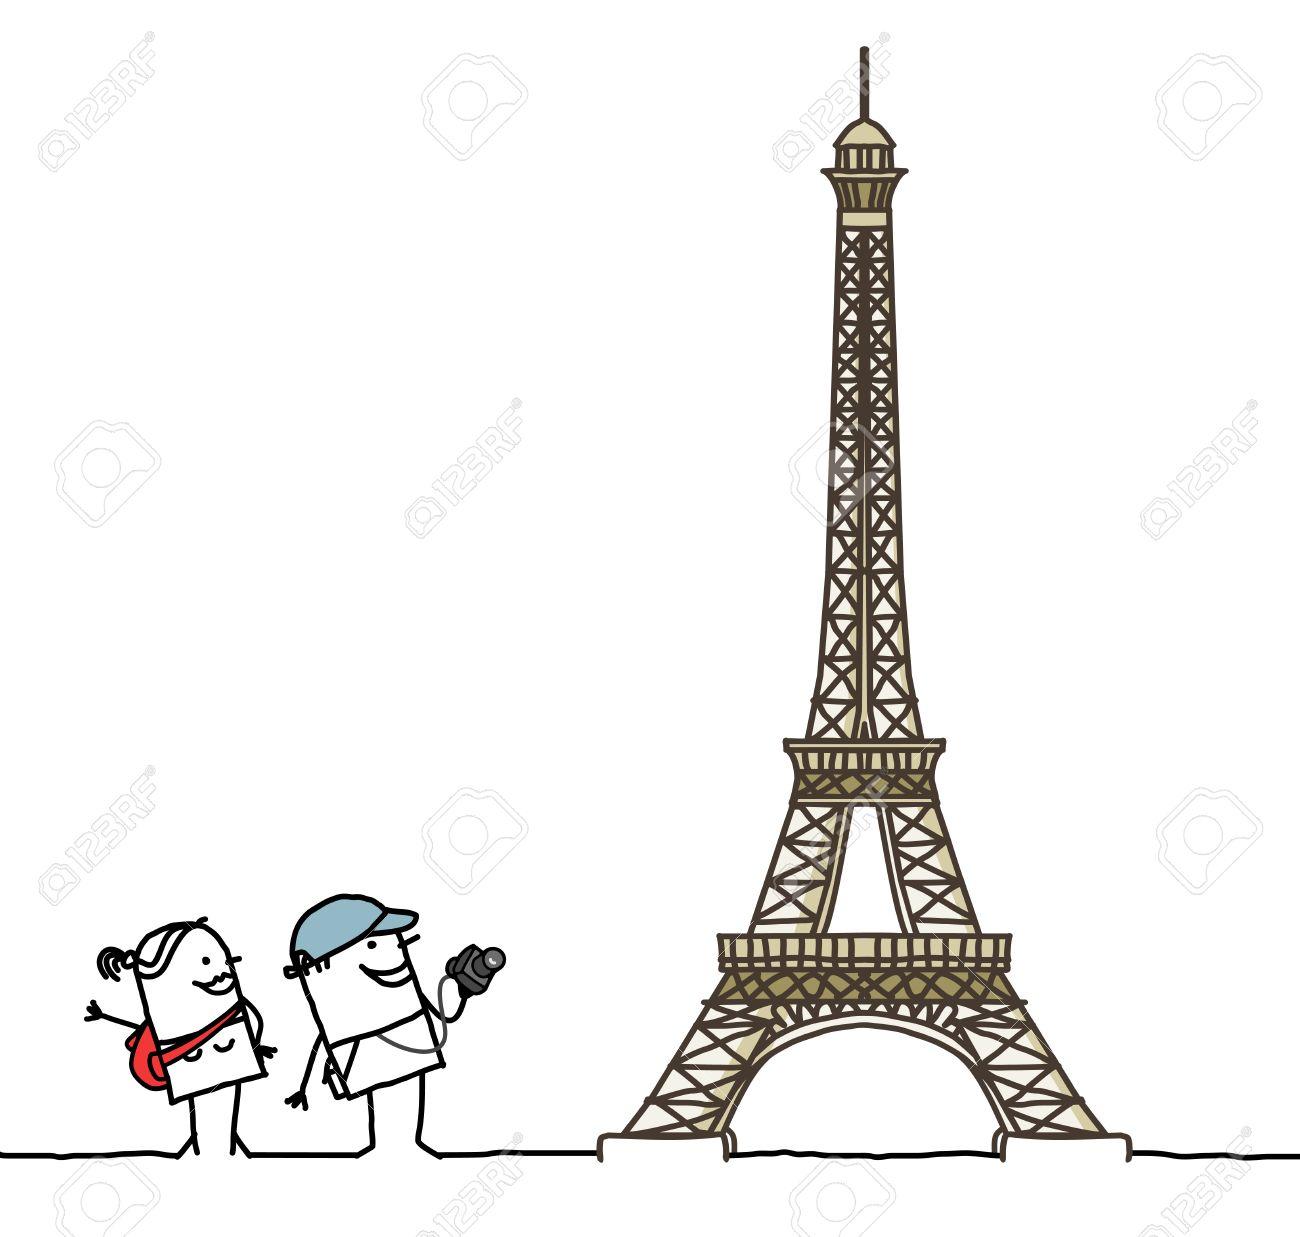 Koleksi Gambar Kartun Animasi Paris